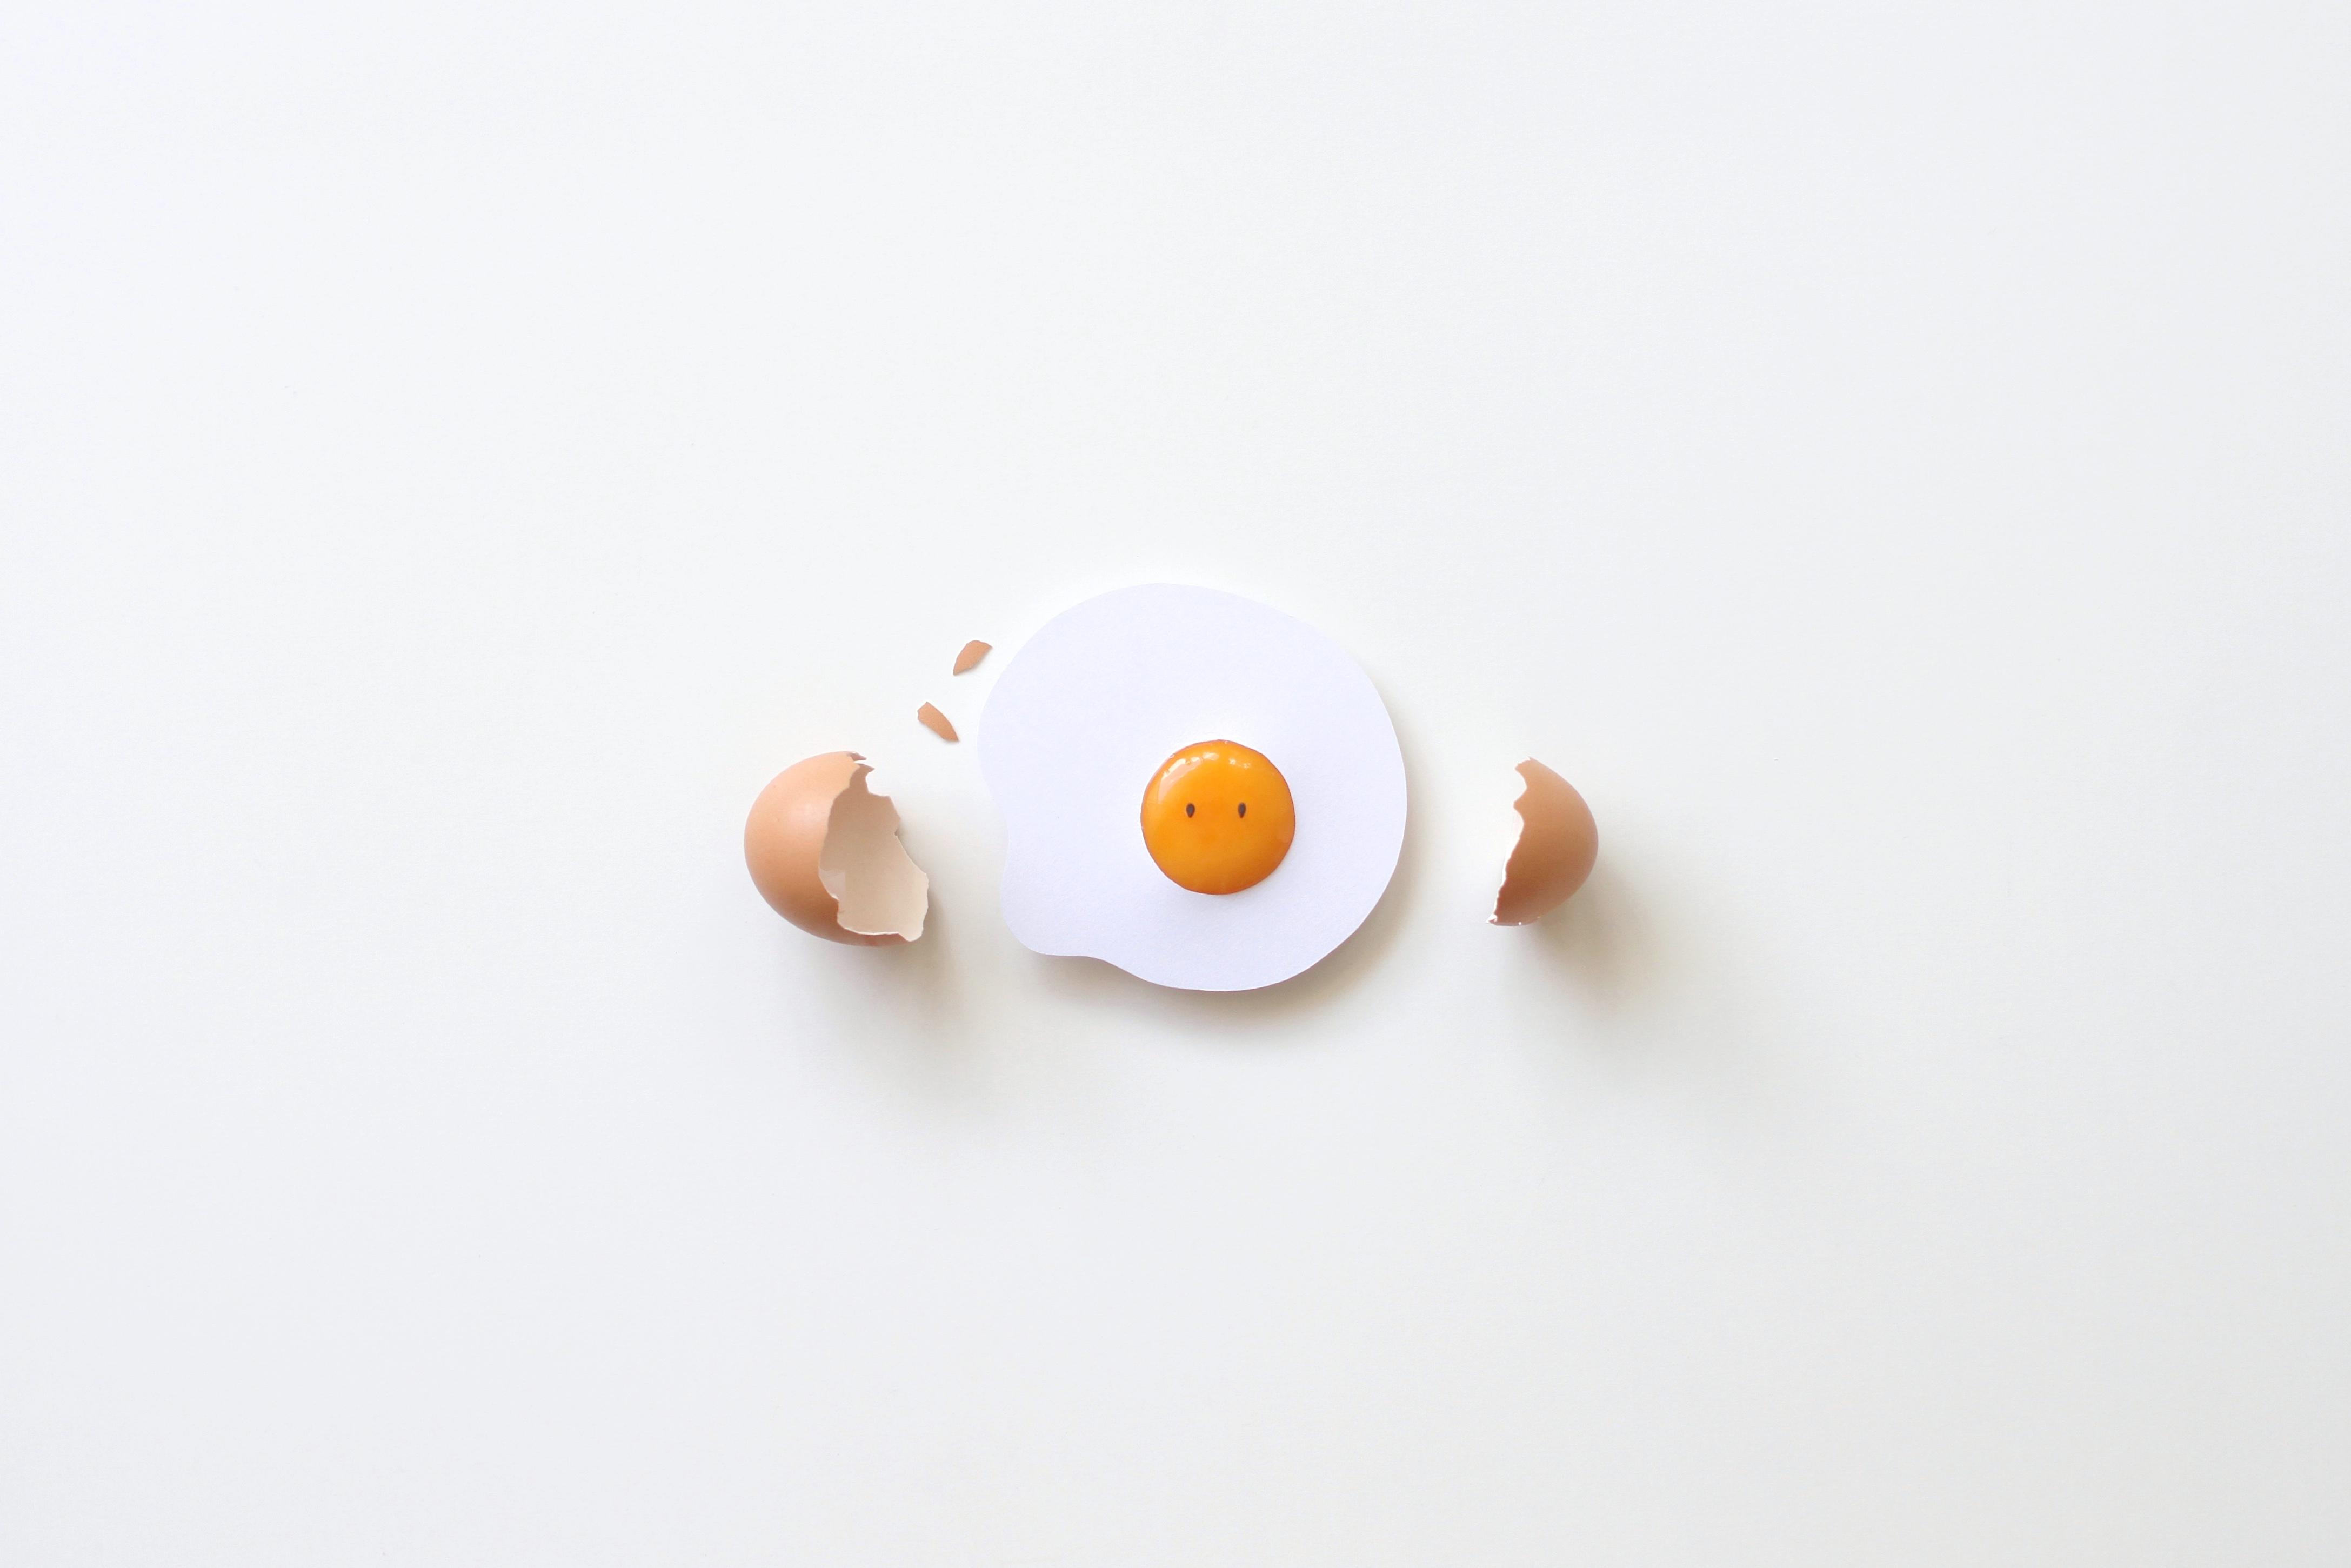 Cconceptual cracked egg